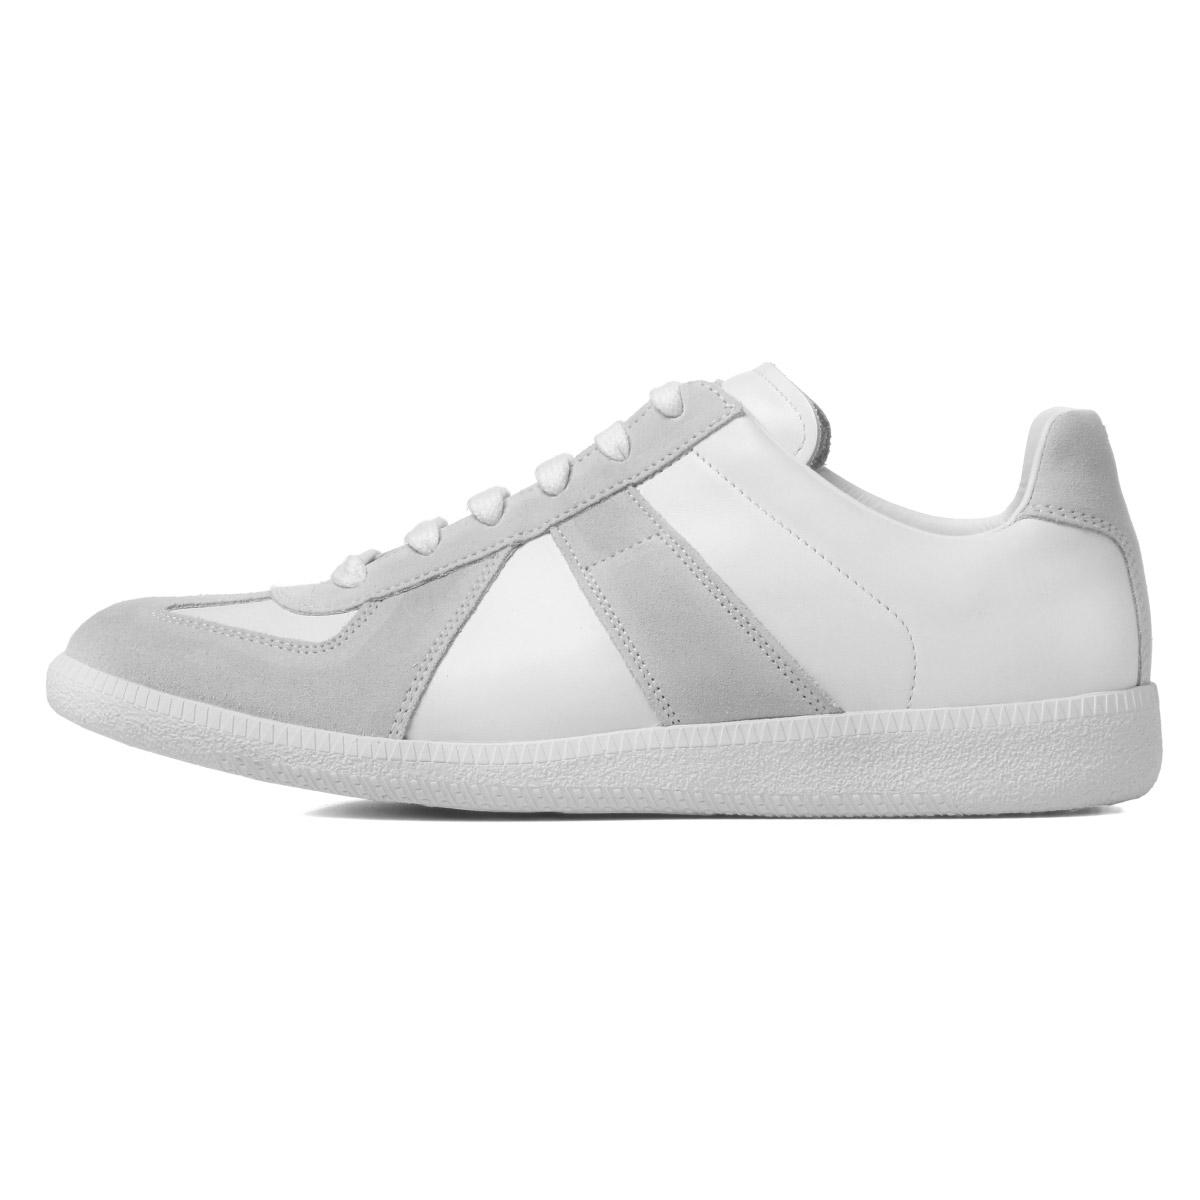 9646de20082 メゾンマルジェラ MAISON MARGIELA shoes men S57WS0236 P1897 101 line 22 German  trainer shoes REPLICA replica WHITE white